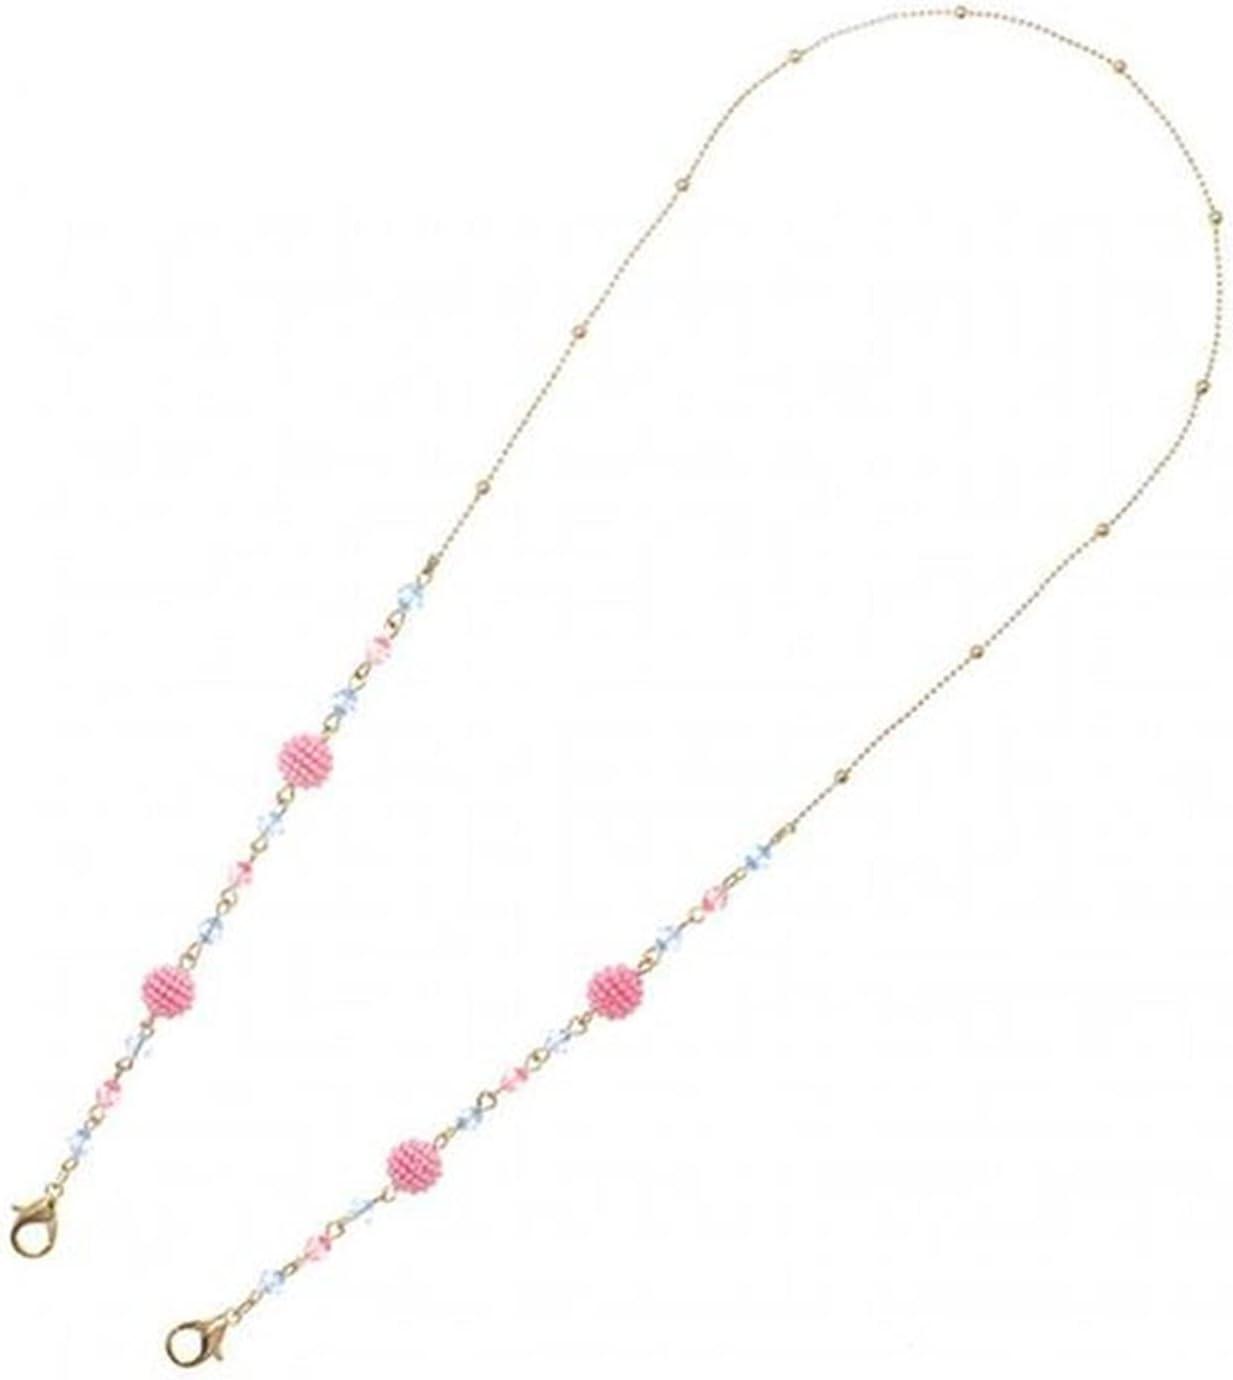 Women Men Eyeglass Cord Prevent Loss Eyewear Holder Neck Lanyard Neck Strap Rope Fashion Pearl Glasses Chain (Color : Gold)